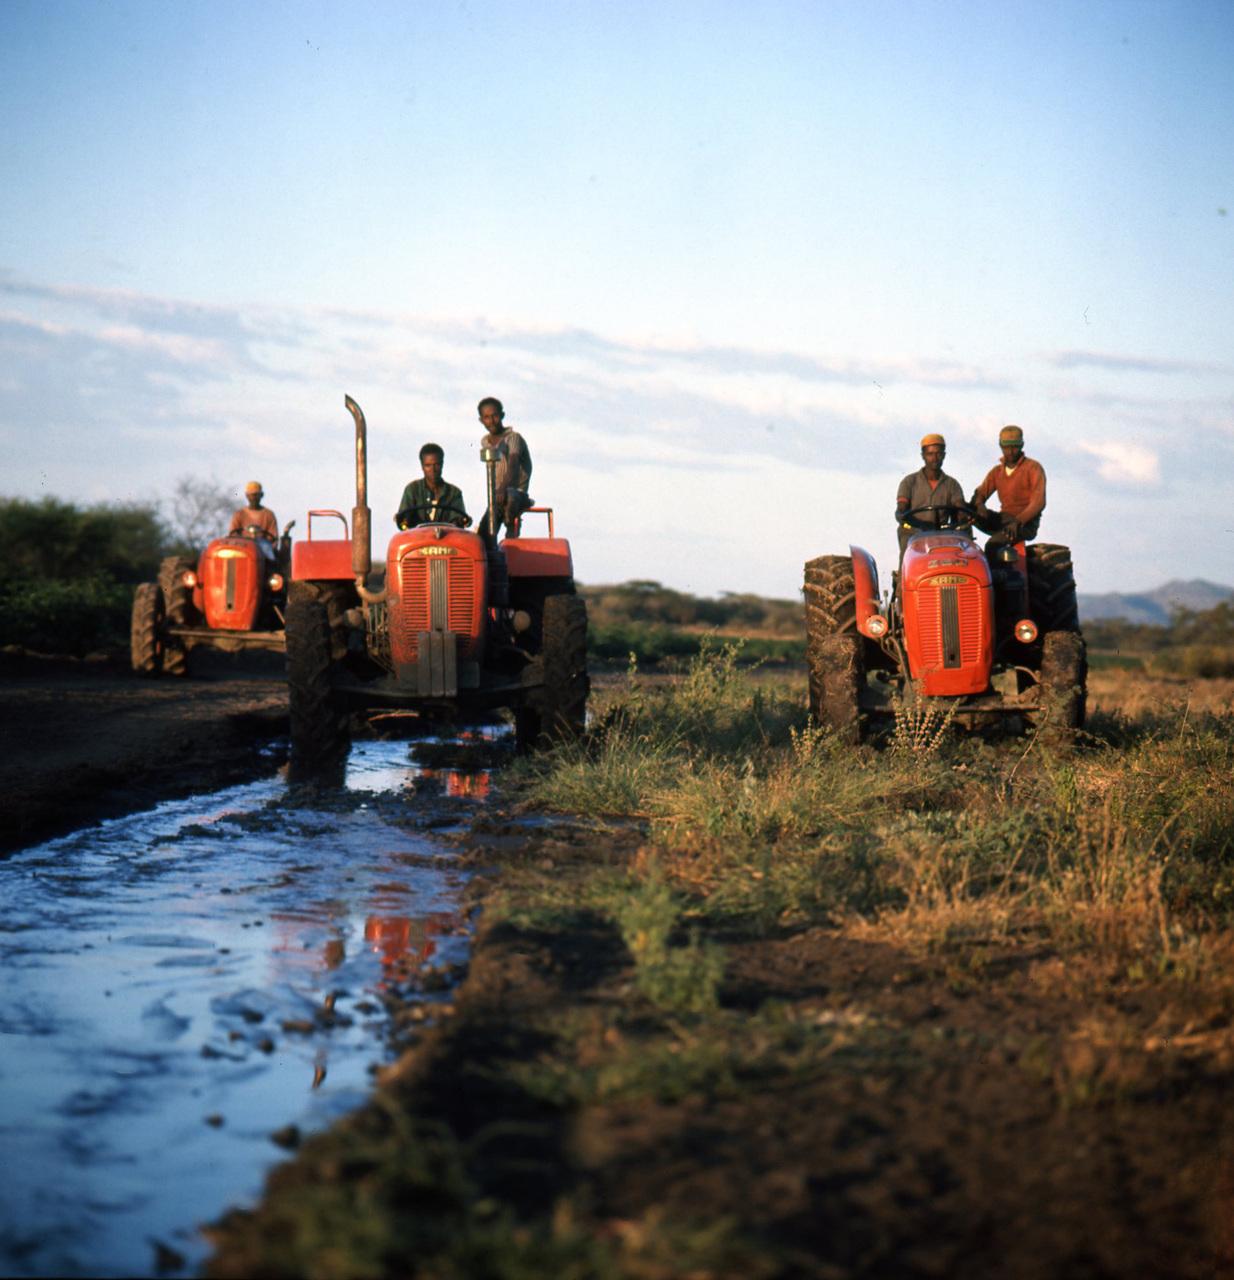 [SAME] Concessione Montanari - Nura Era (Africa) - 1967